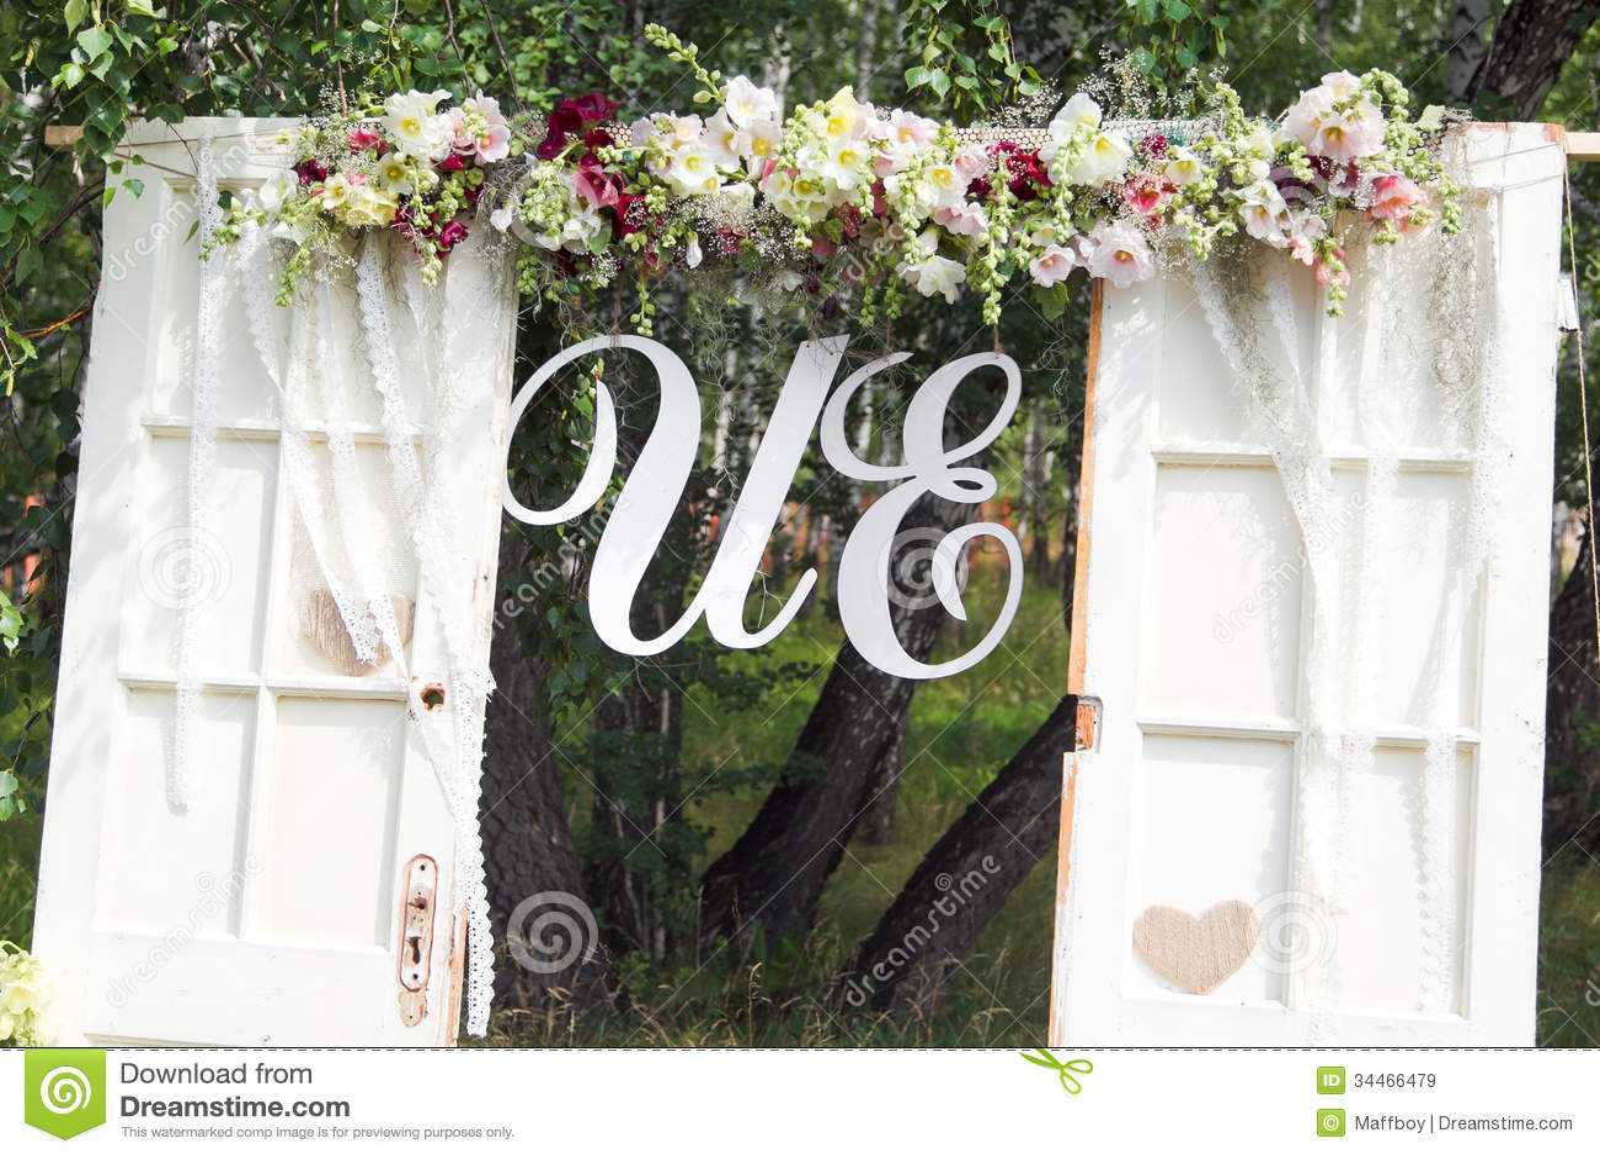 wedding-arch-beautiful-arrangement-flowe